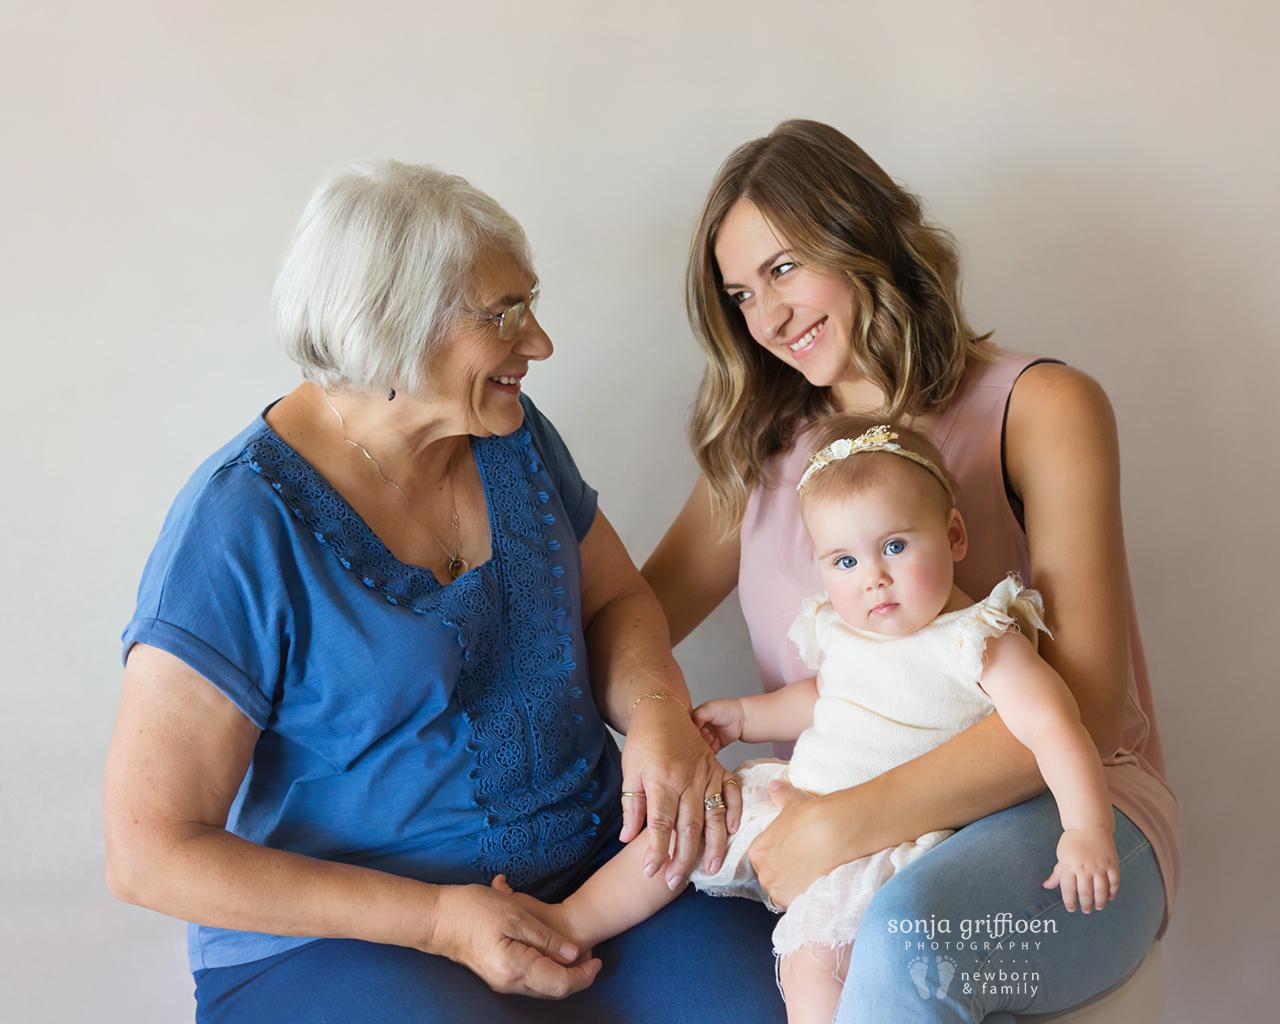 Thalia-Milestone-Brisbane-Newborn-Photographer-Sonja-Griffioen-17.jpg